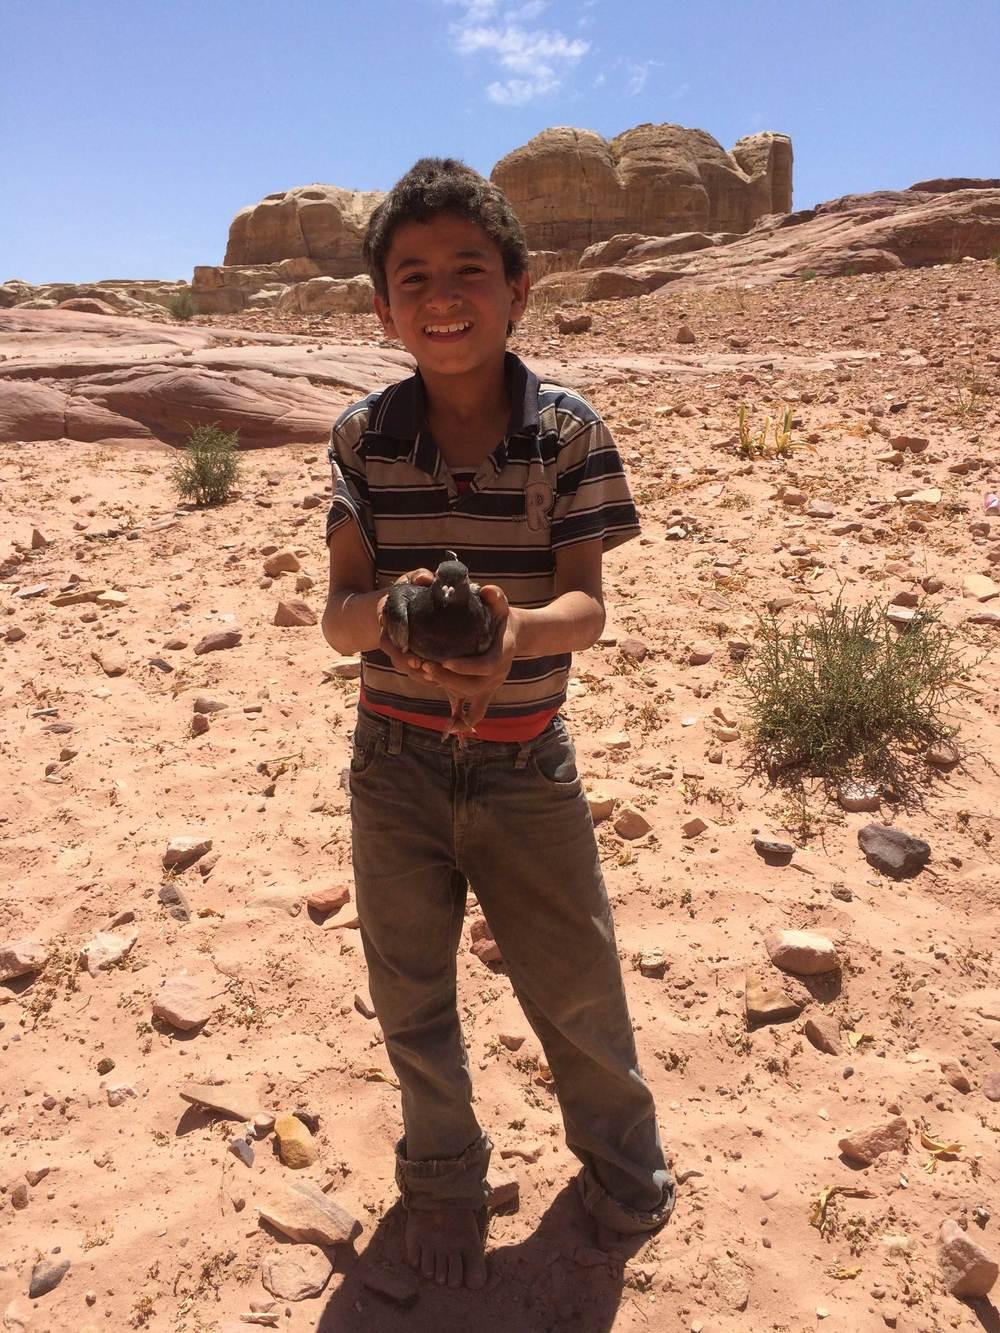 jordan desert bedouin akela newman this world exists thisworldexists